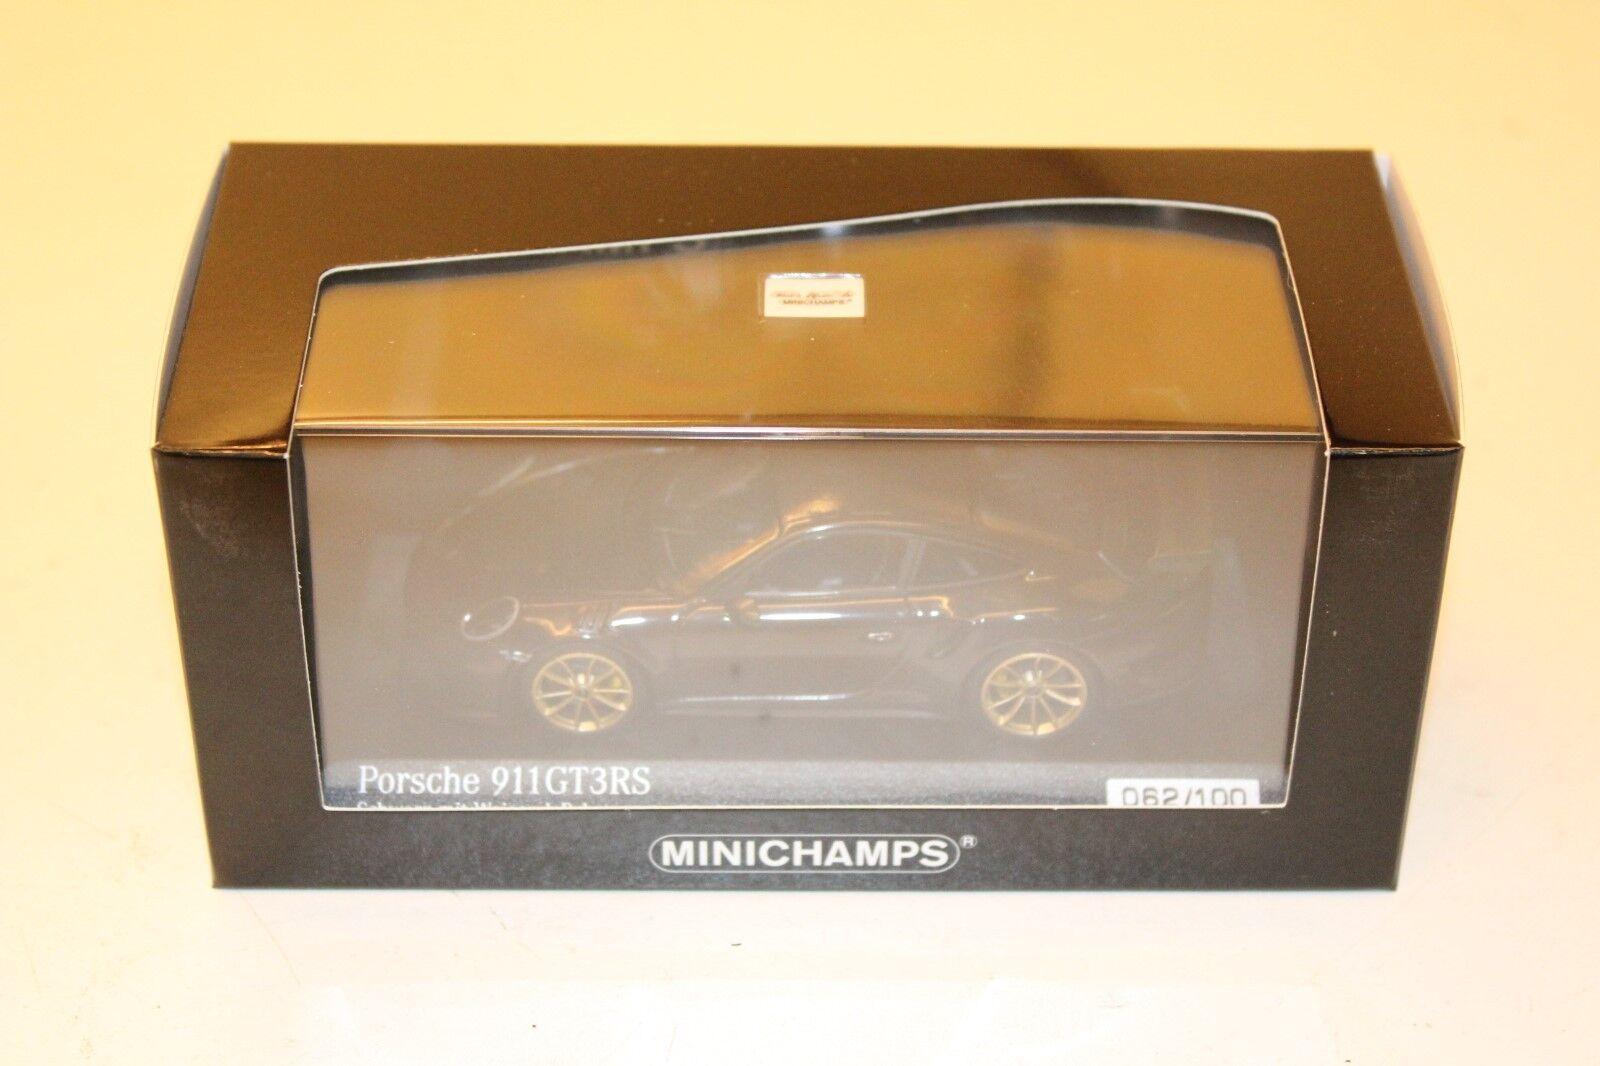 MINICHAMPS 1 43 PORSCHE 911 (991.) GT3RS noir 062 100 413067031